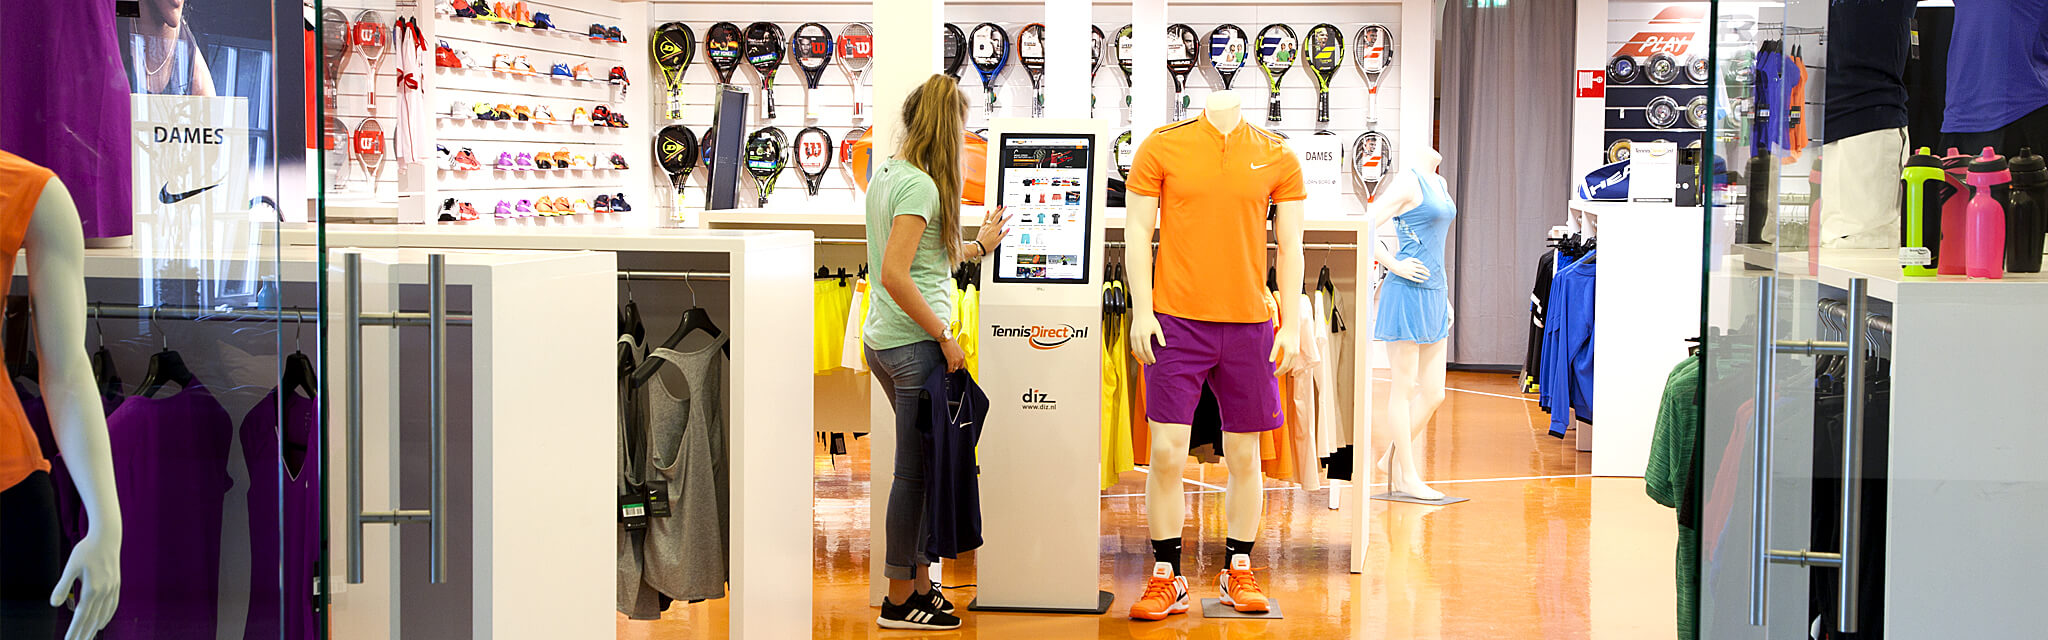 Tennis Direct, shop-in-shop kiosk